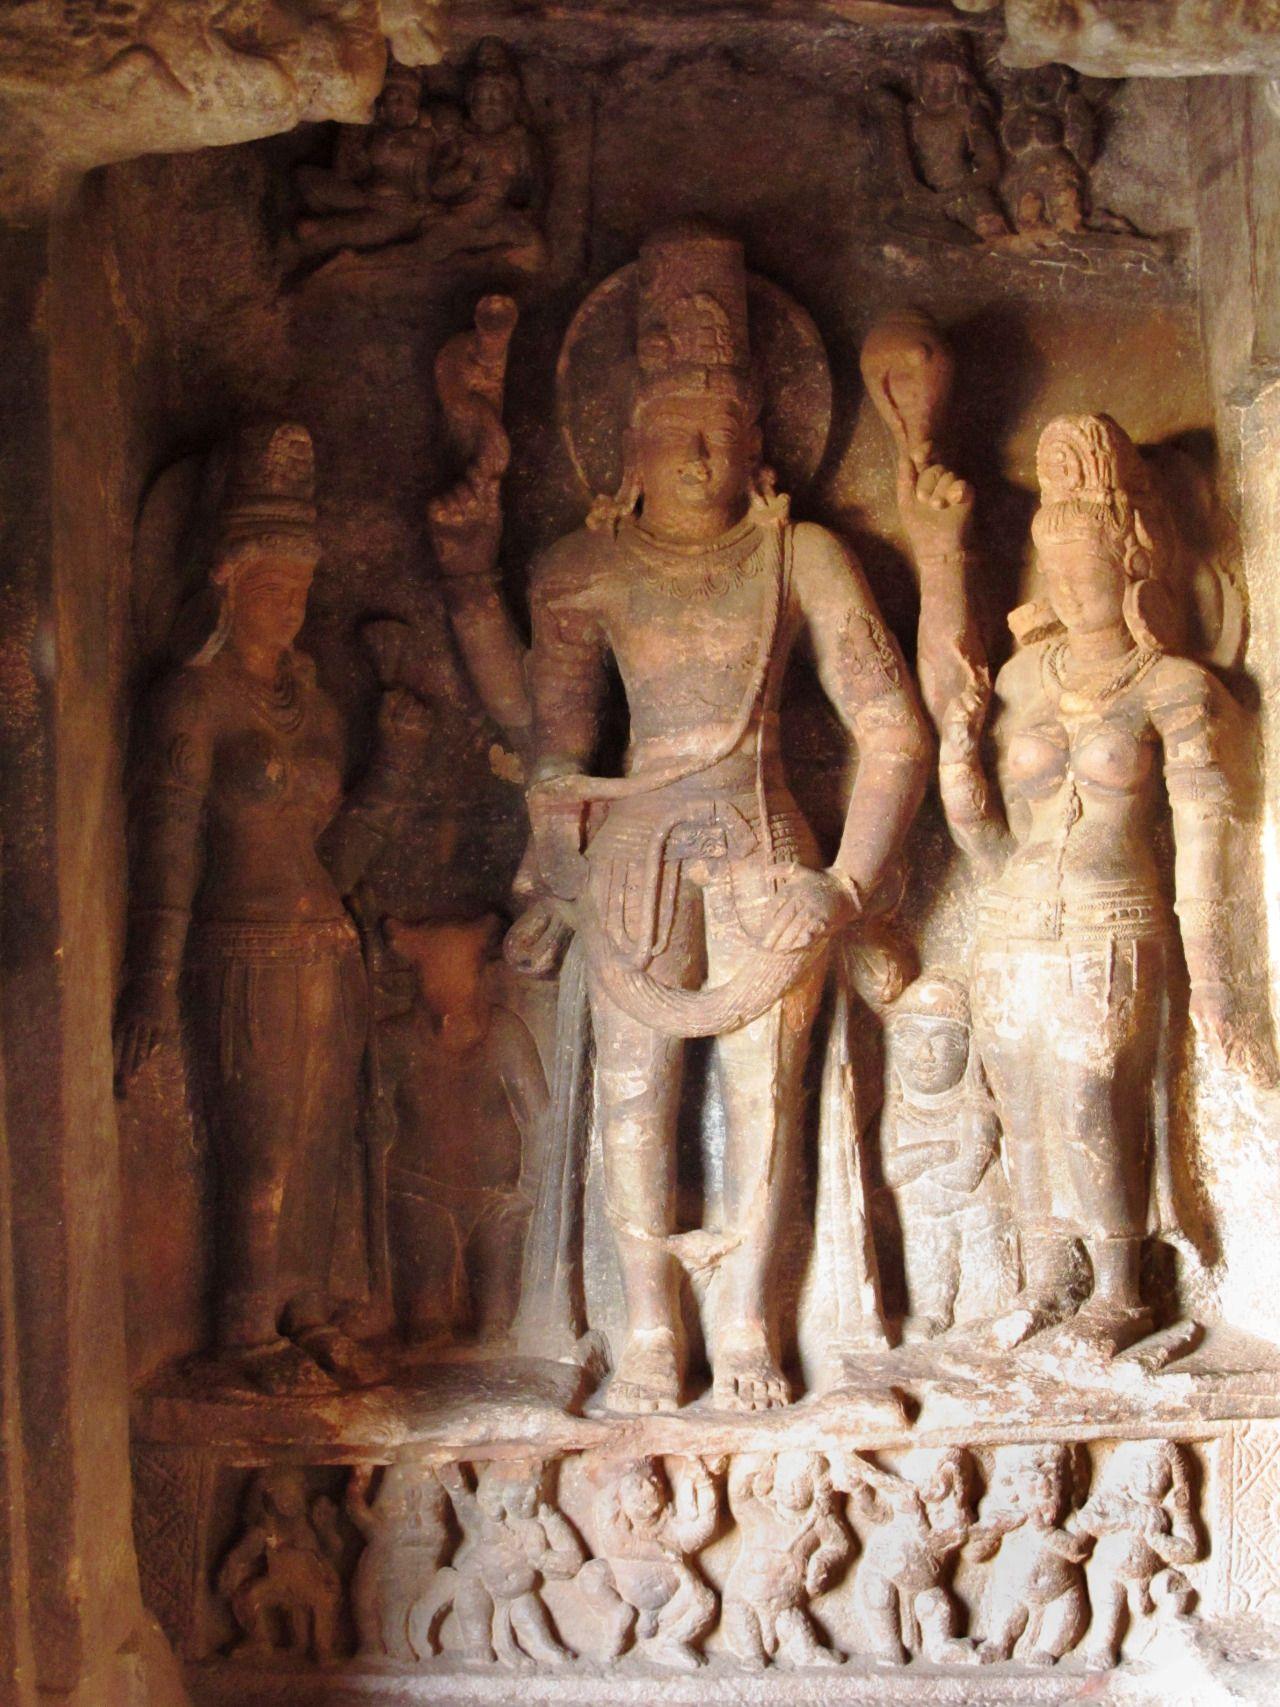 12th century statue found in Tiruvannamalai!